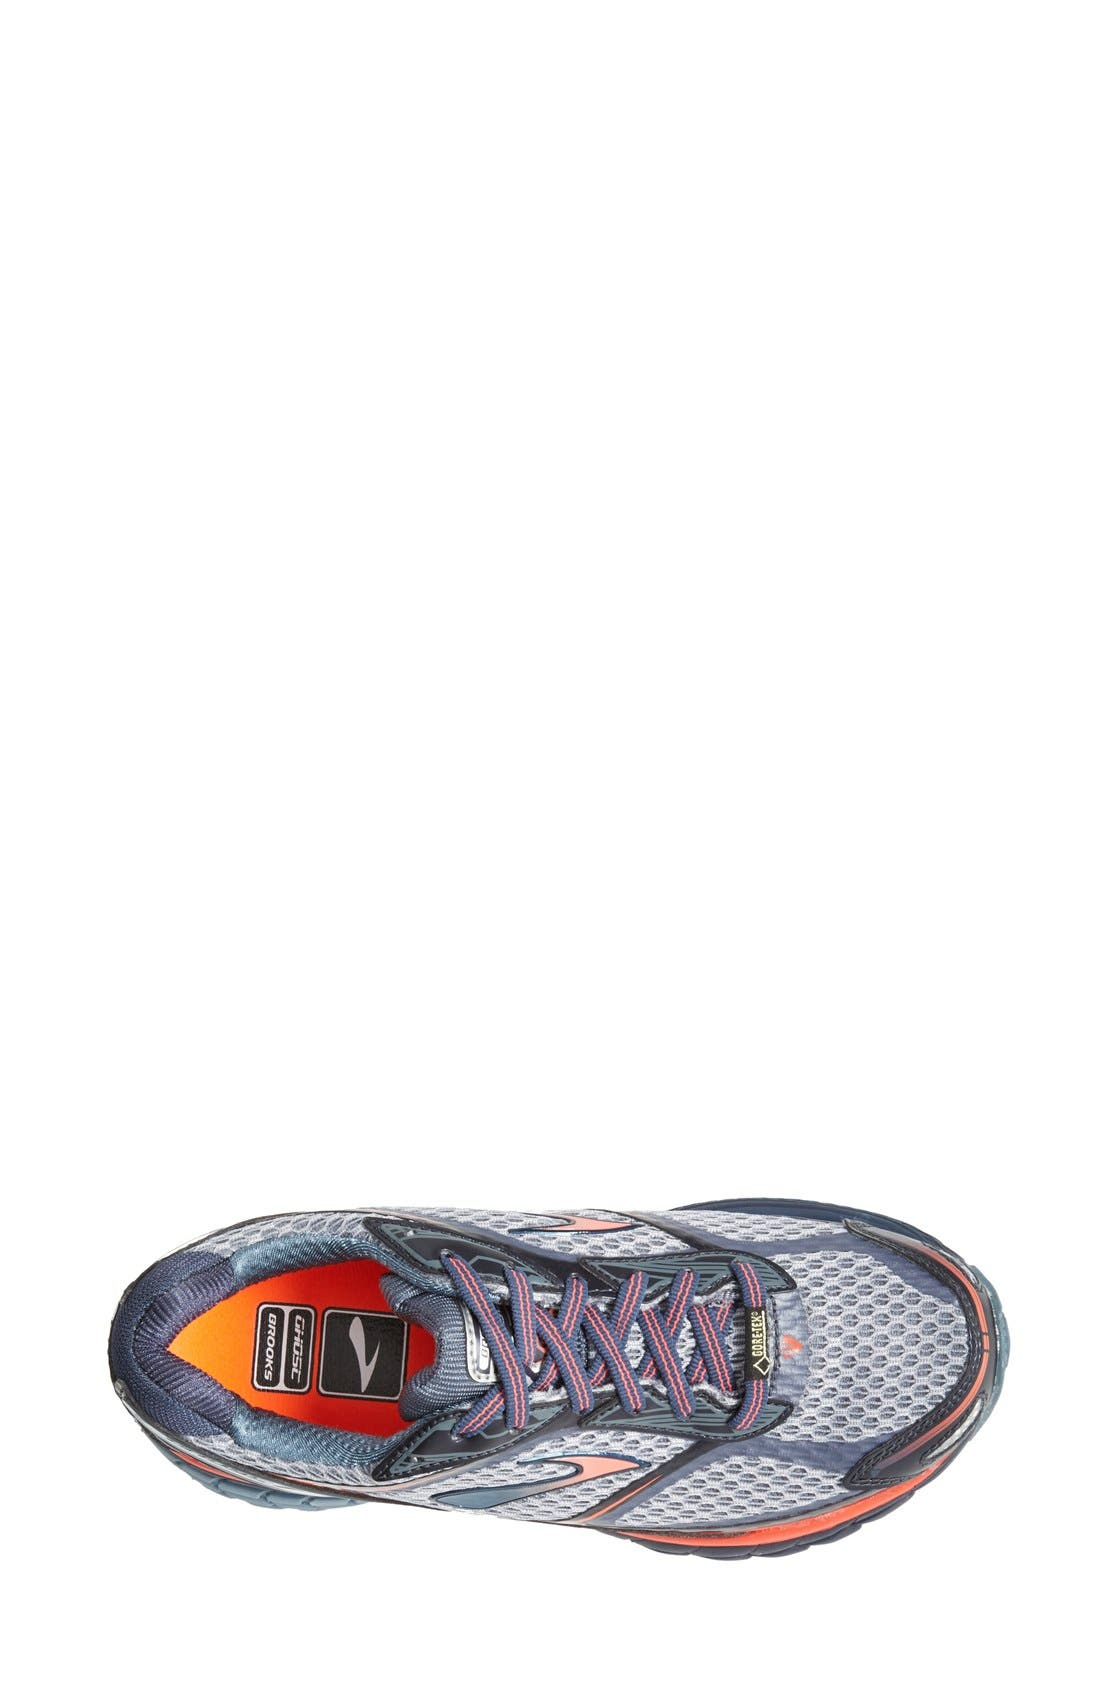 Alternate Image 3  - Brooks 'Ghost 7 GTX' Waterproof Running Shoe (Women)